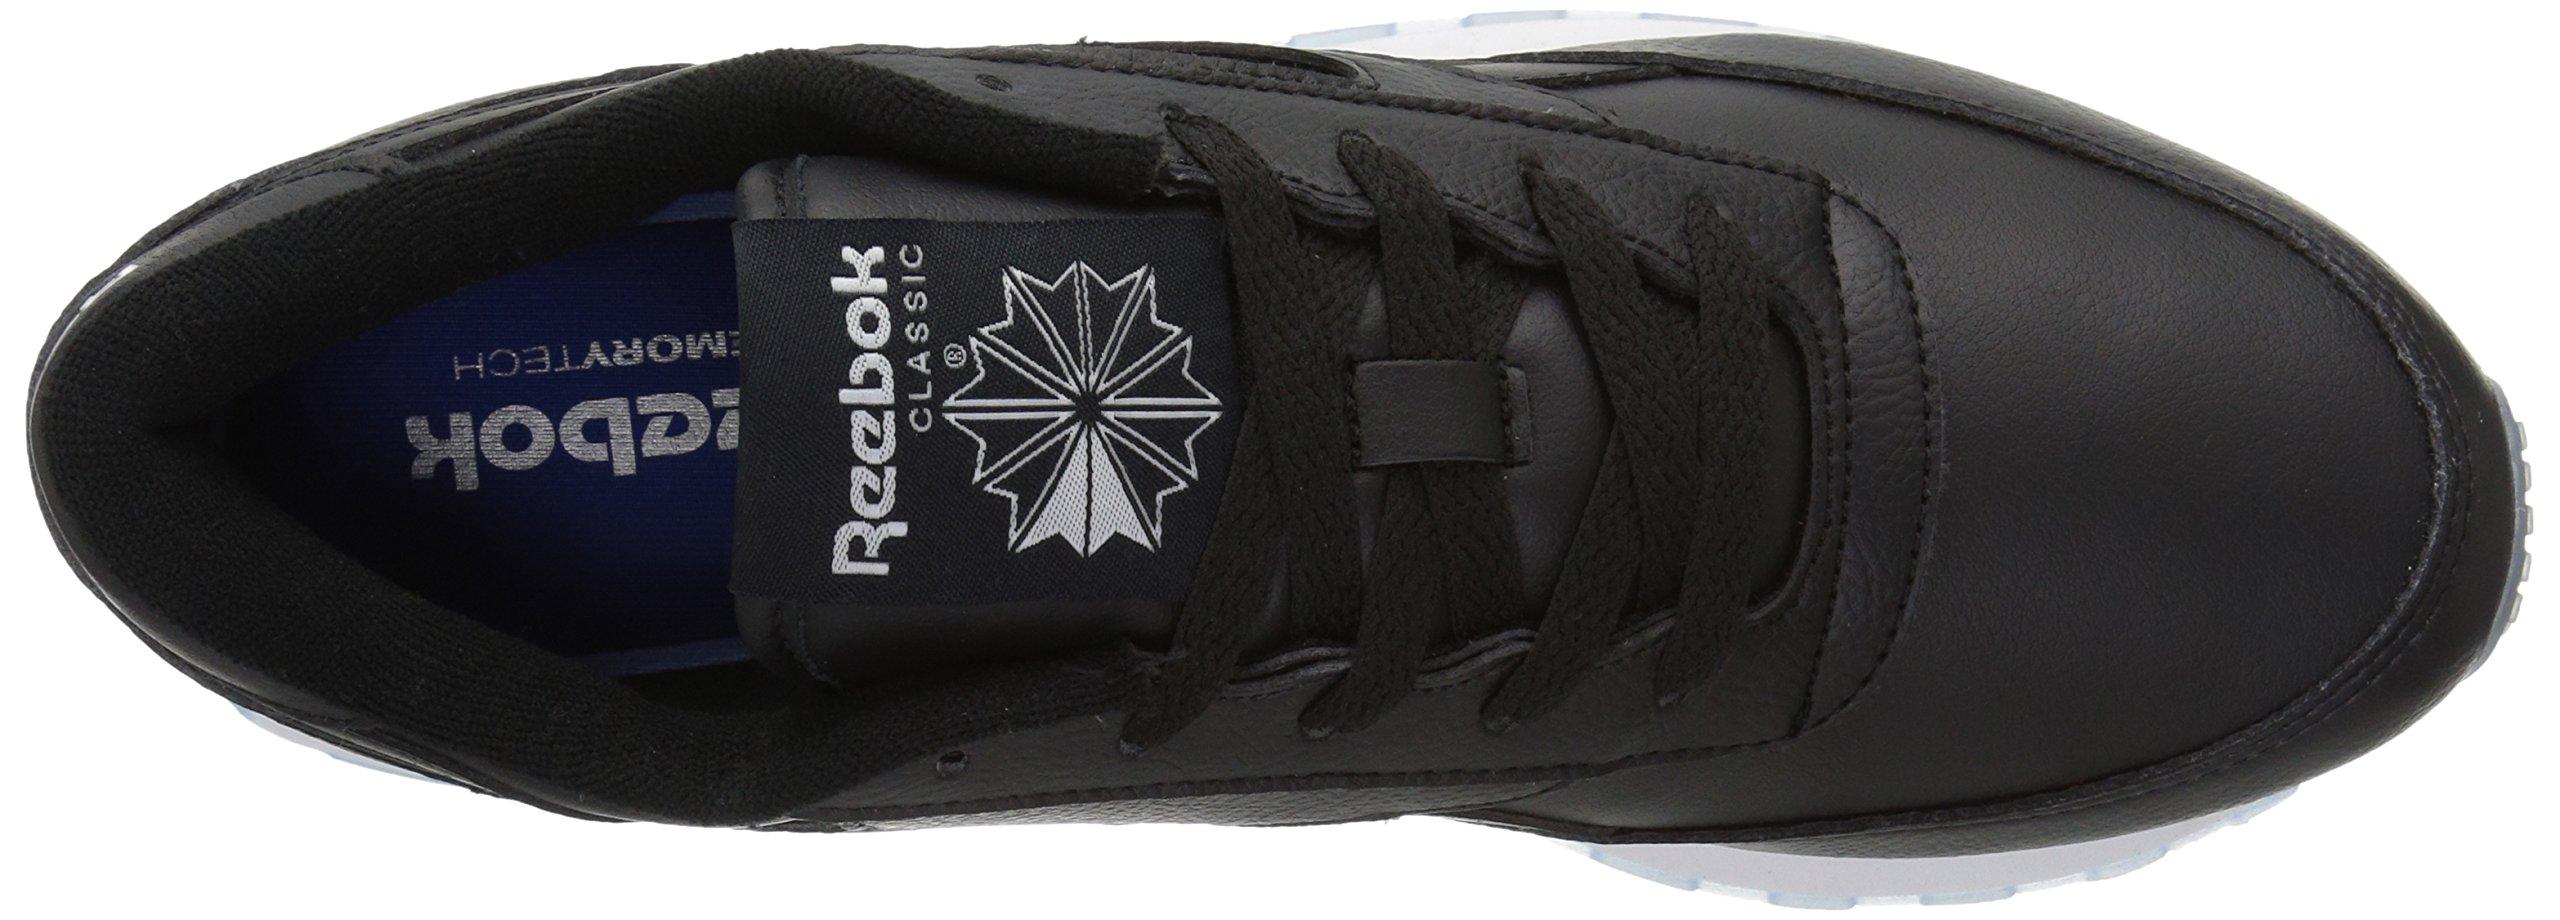 6c6791f0d68 Reebok Women s Cl Renaissance Ice Fashion Sneaker